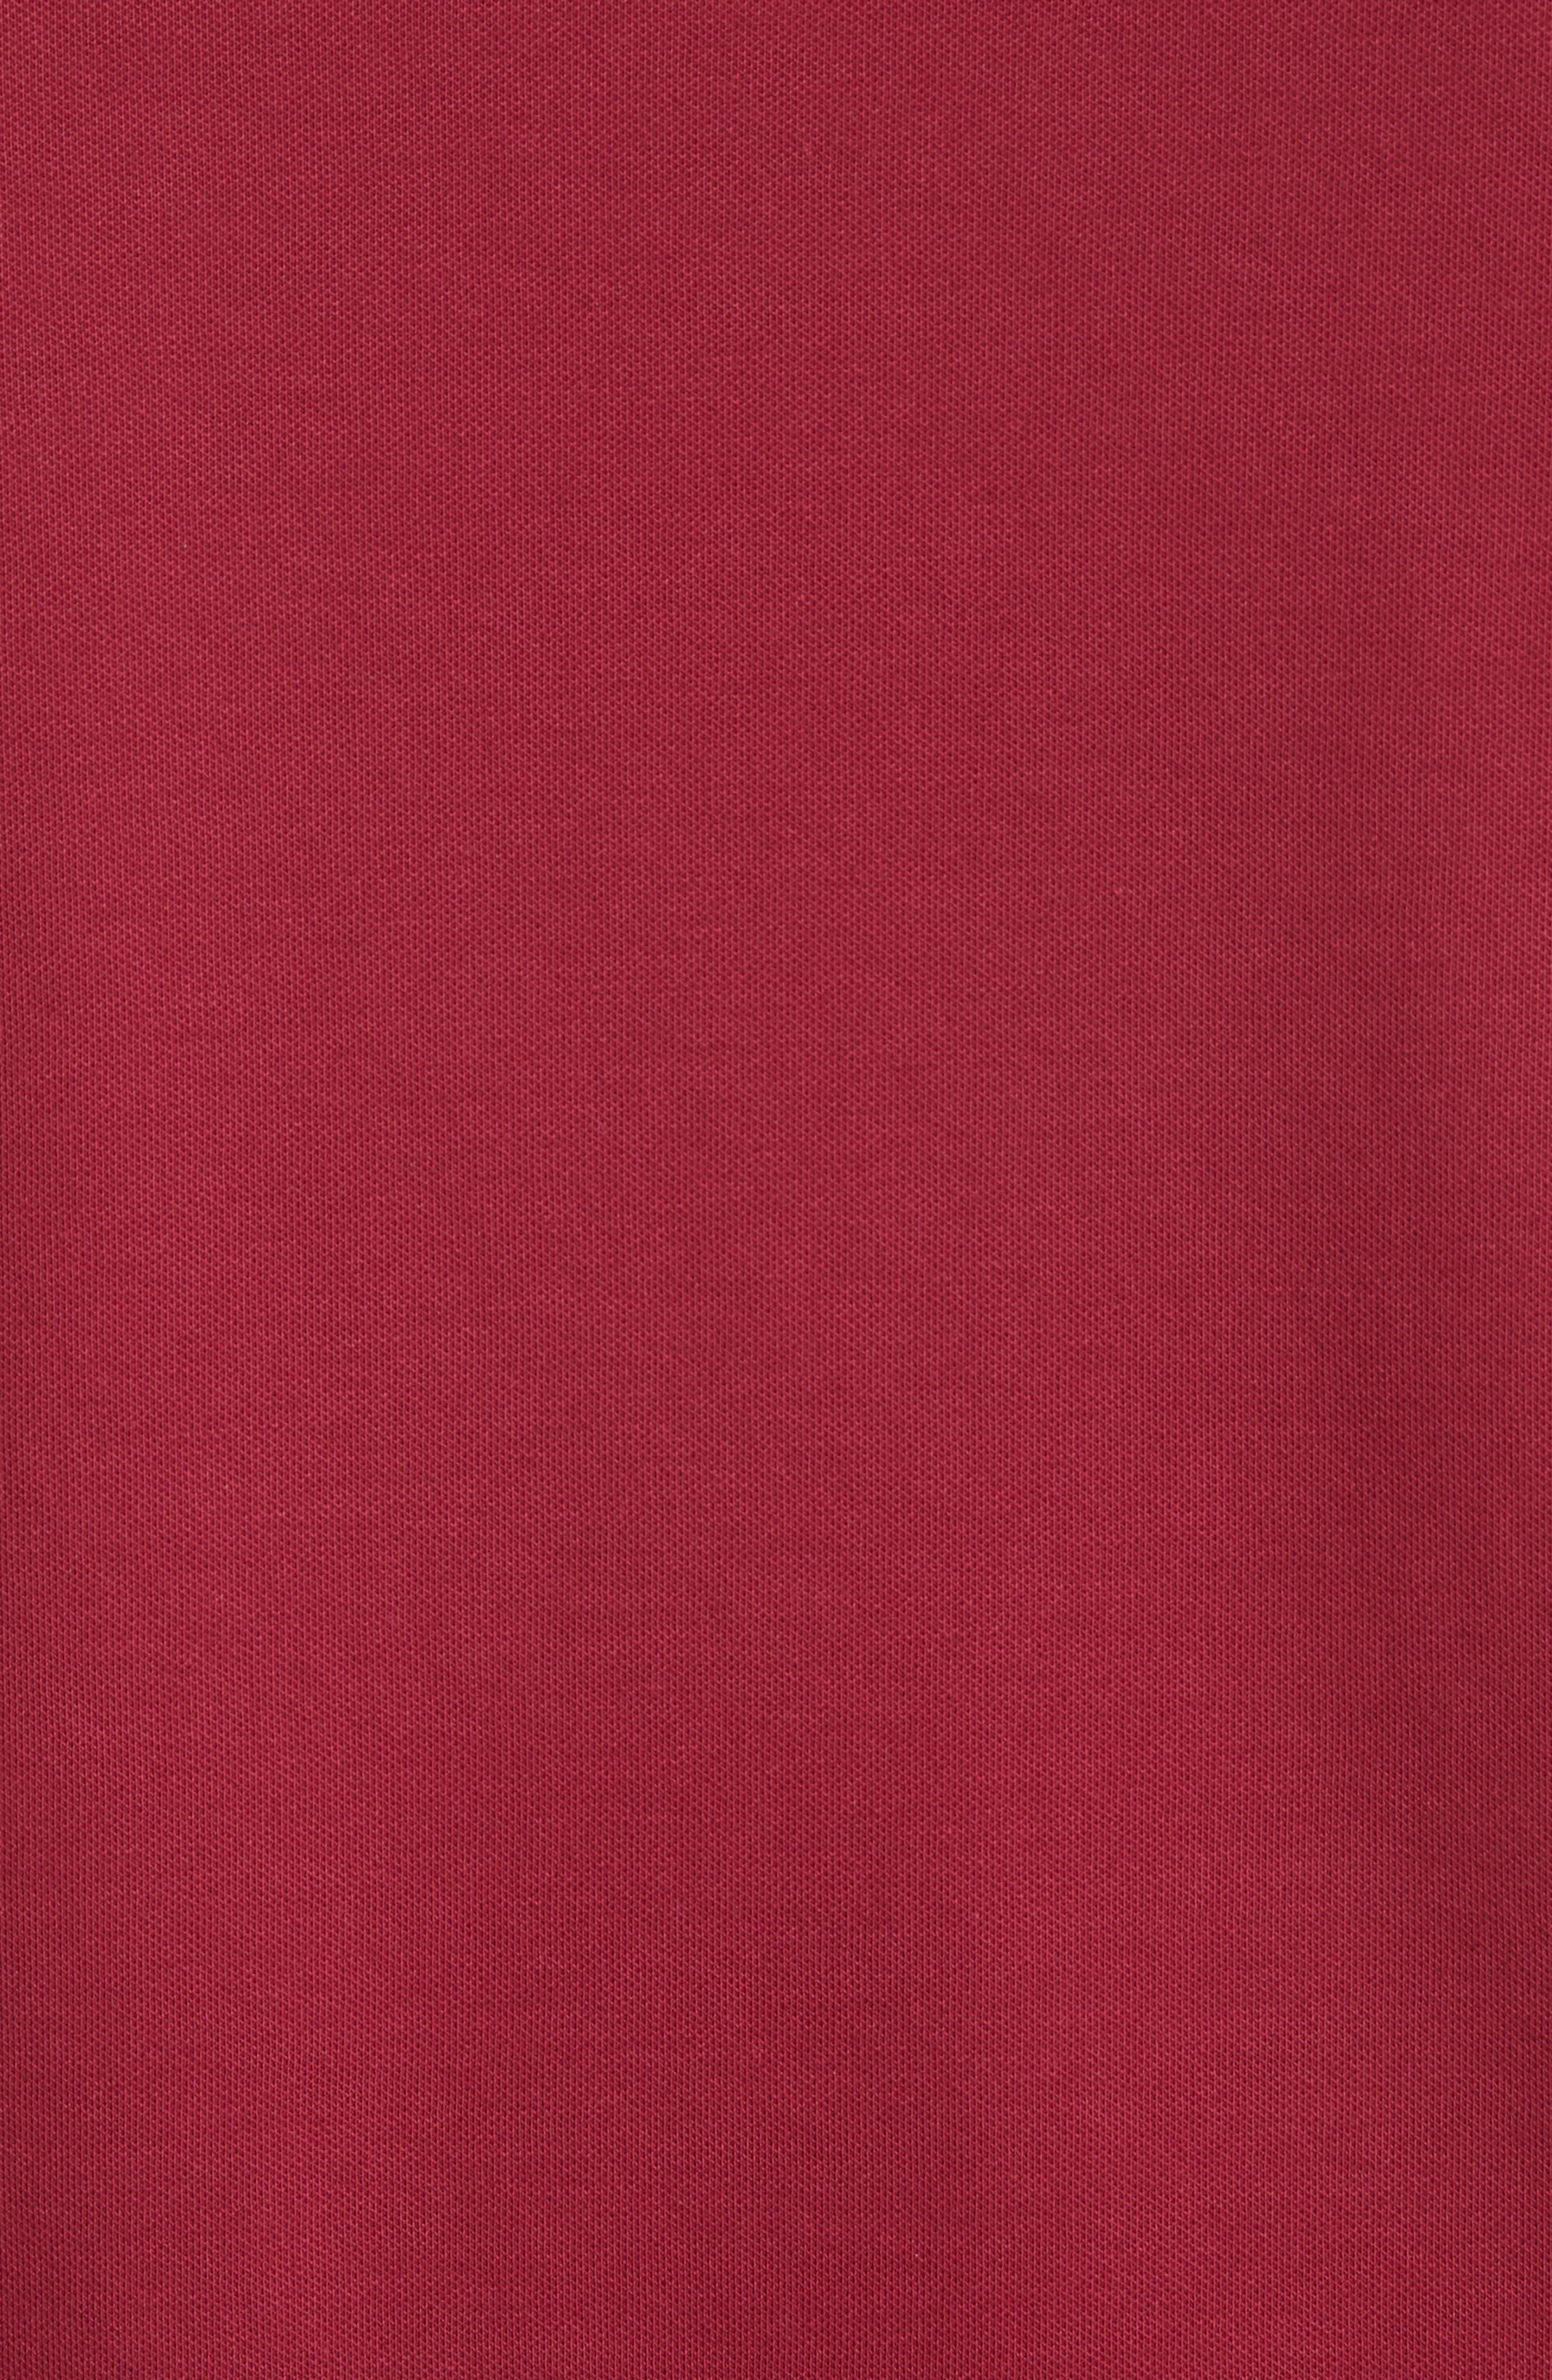 Slim Fit Piqué Polo Shirt,                             Alternate thumbnail 5, color,                             Borgogna